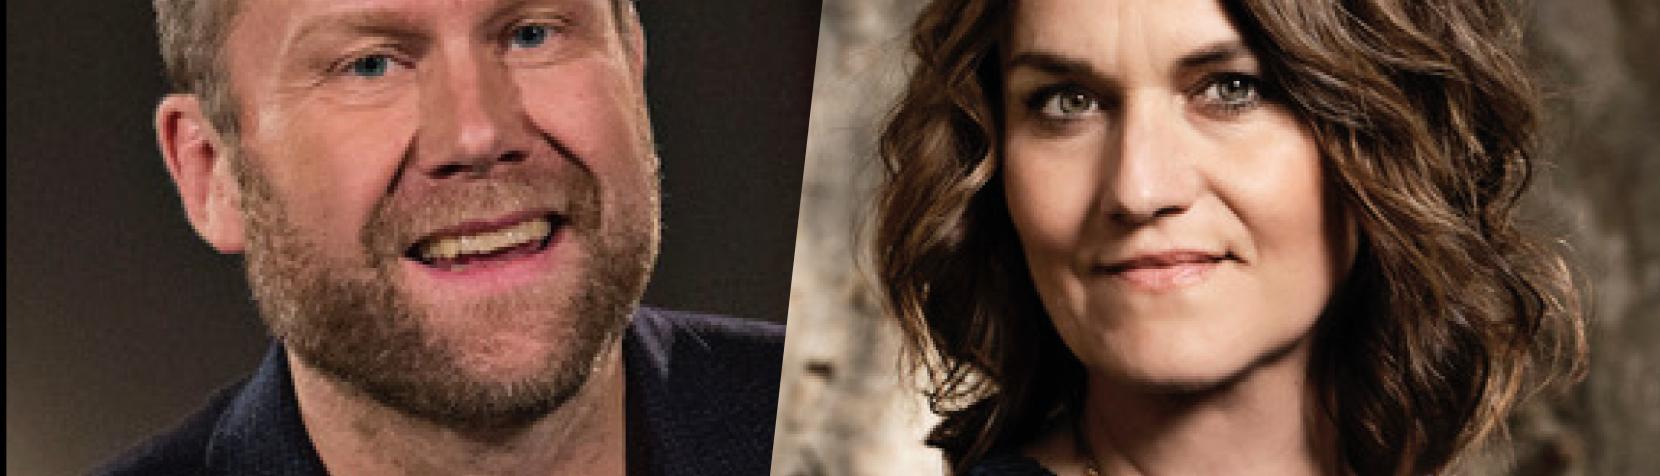 Ole Kibsgaard og Lisbeth Sagen